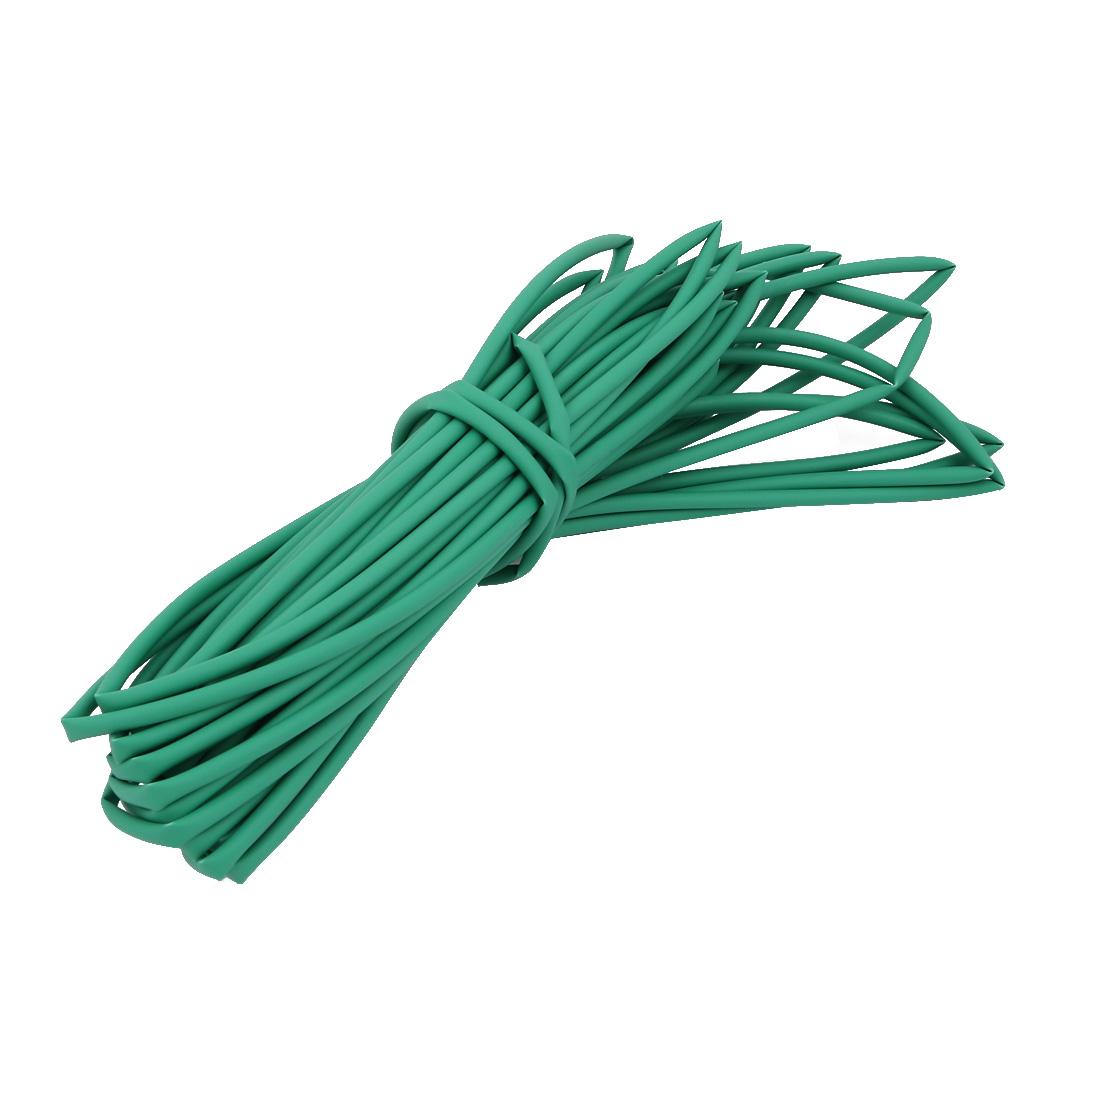 10M 0.08in Inner Dia Polyolefin Flame Retardant Tube Green for Wire Repairing